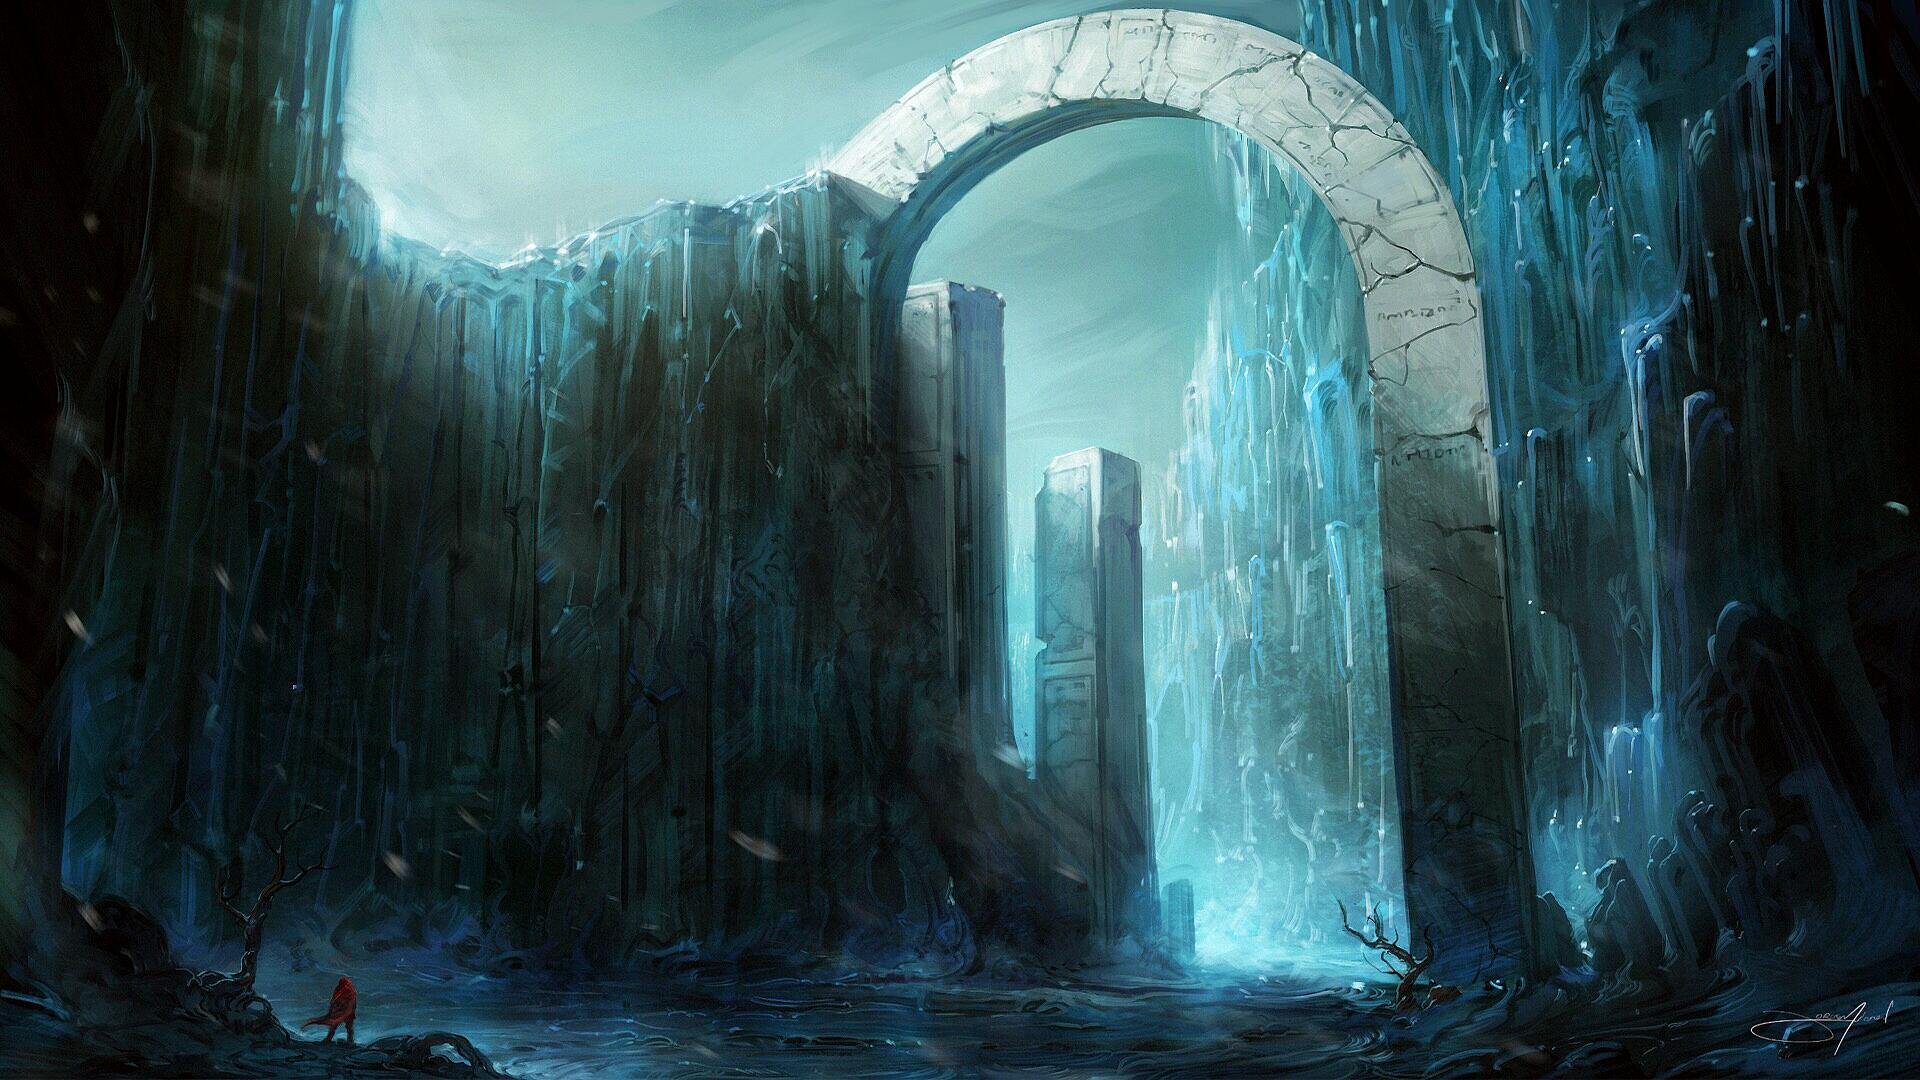 General 1920x1080 Jorge Jacinto digital art artwork fantasy art alone standing ice arch Fantasy Architecture mountains cyan